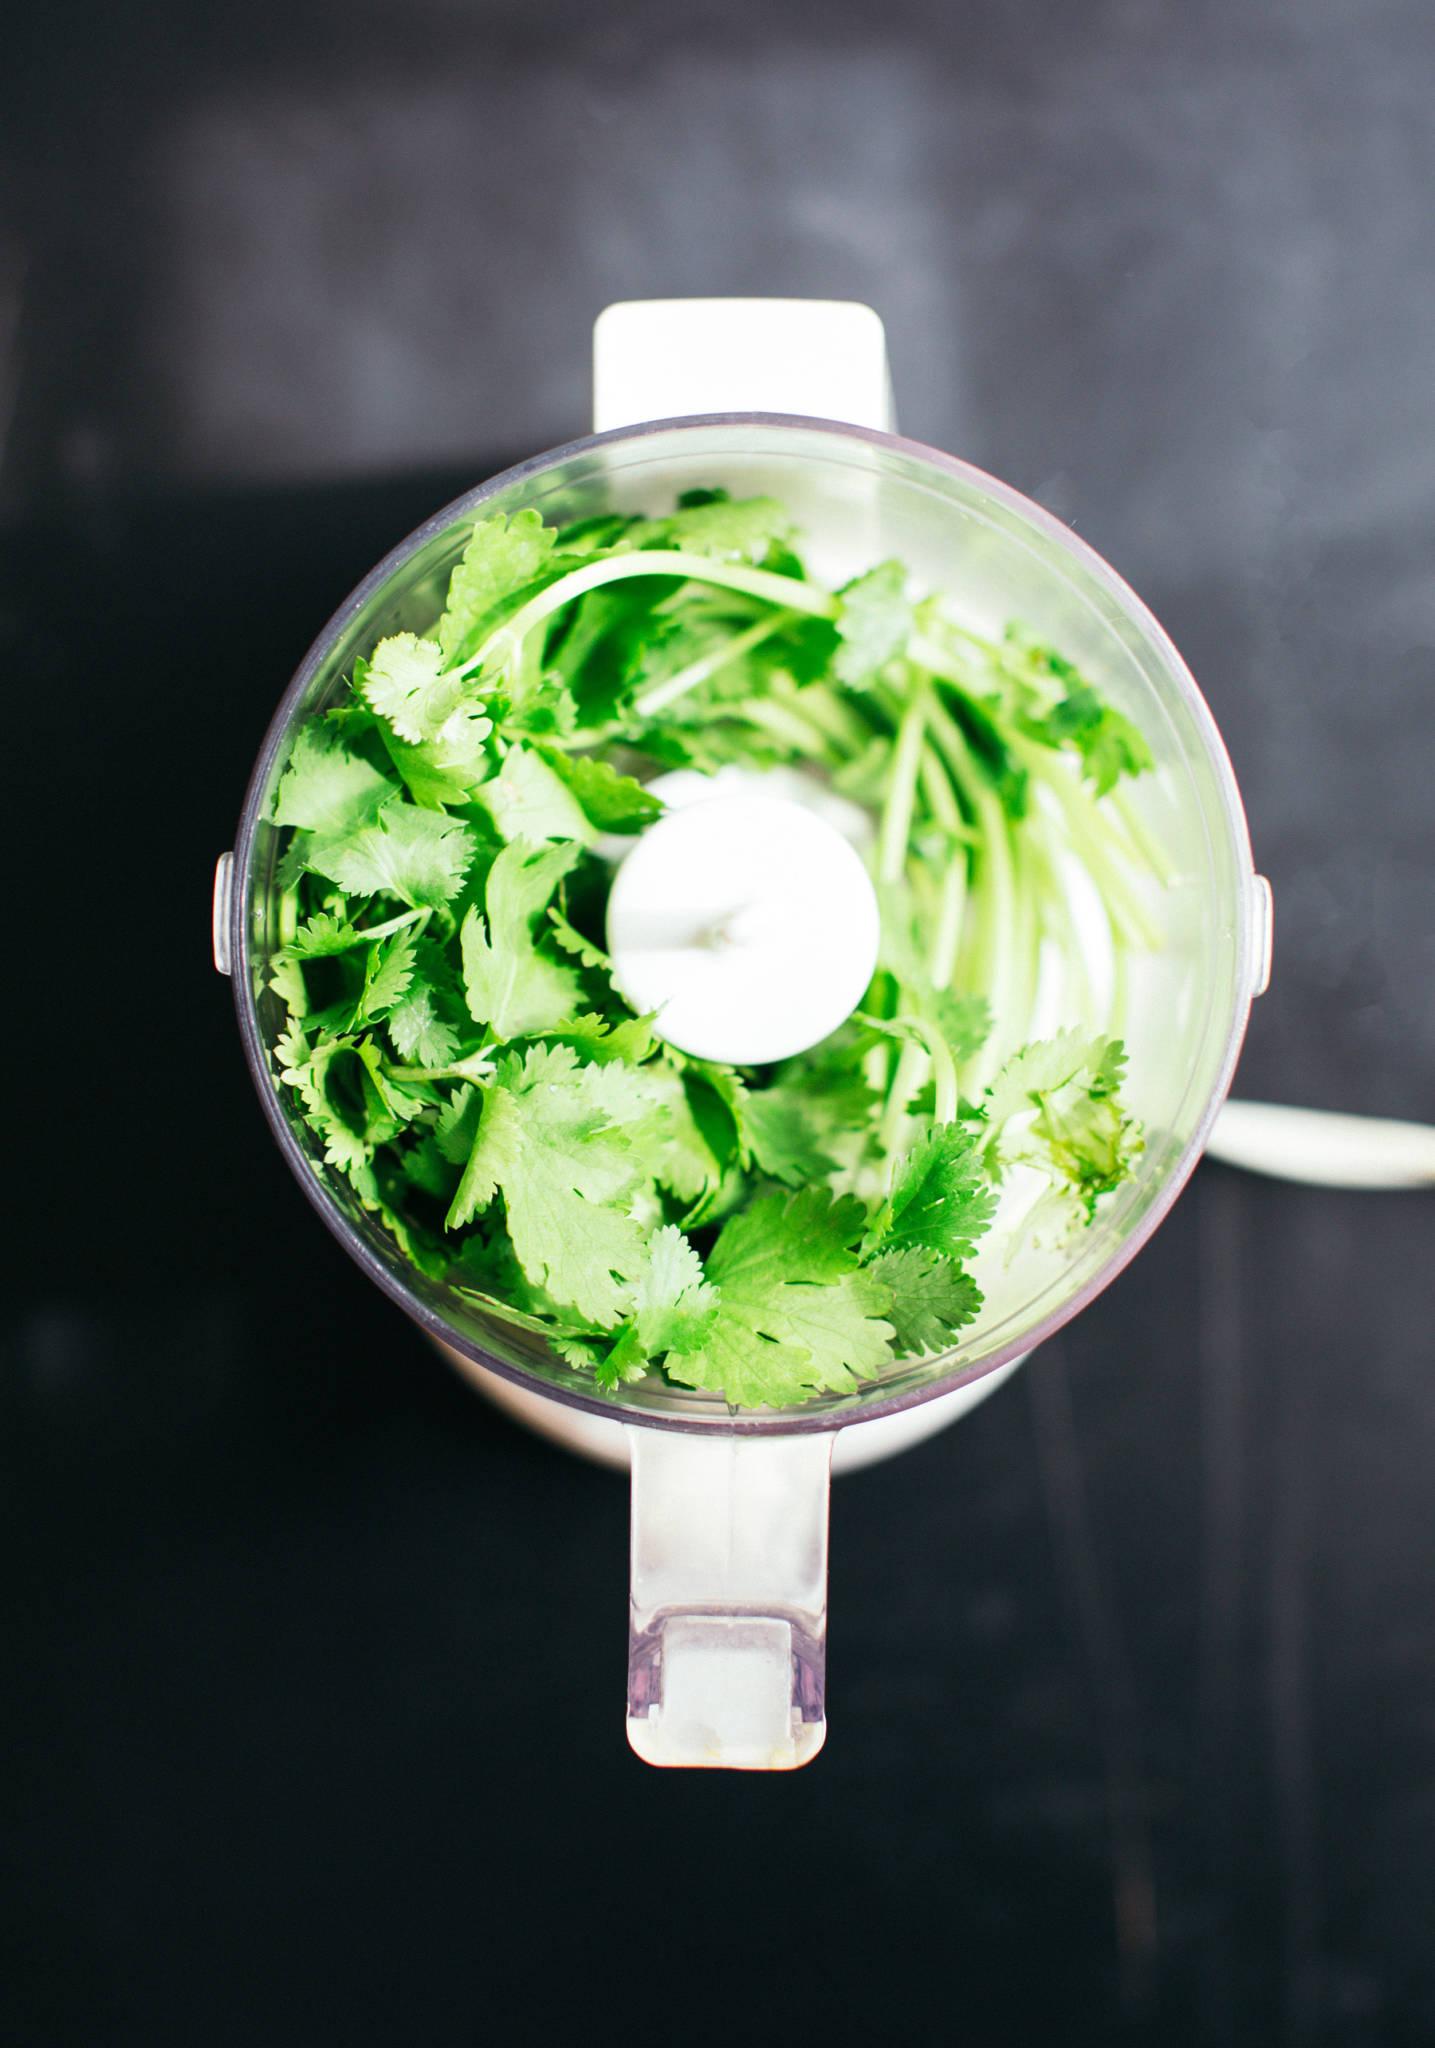 Spring Detox Cilantro Tahini Salad Dressing Recipe